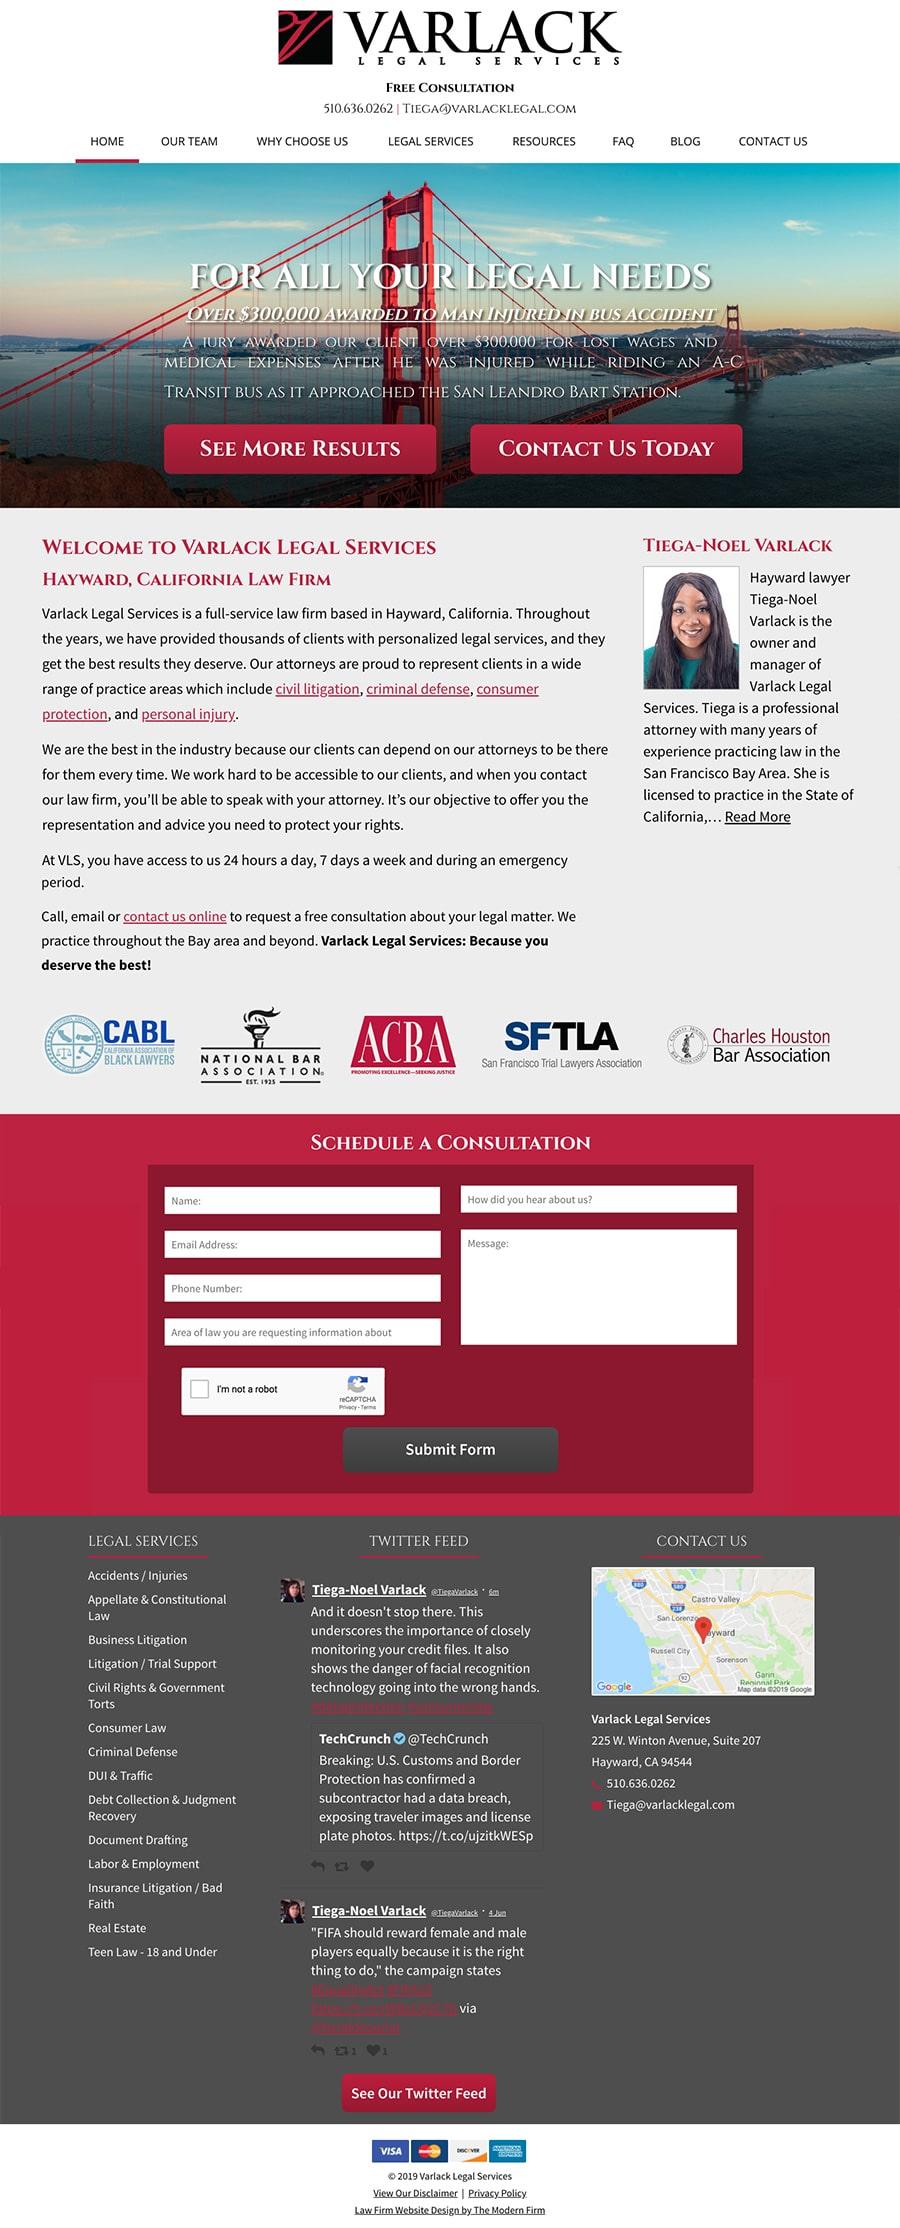 Law Firm Website Design for Varlack Legal Services